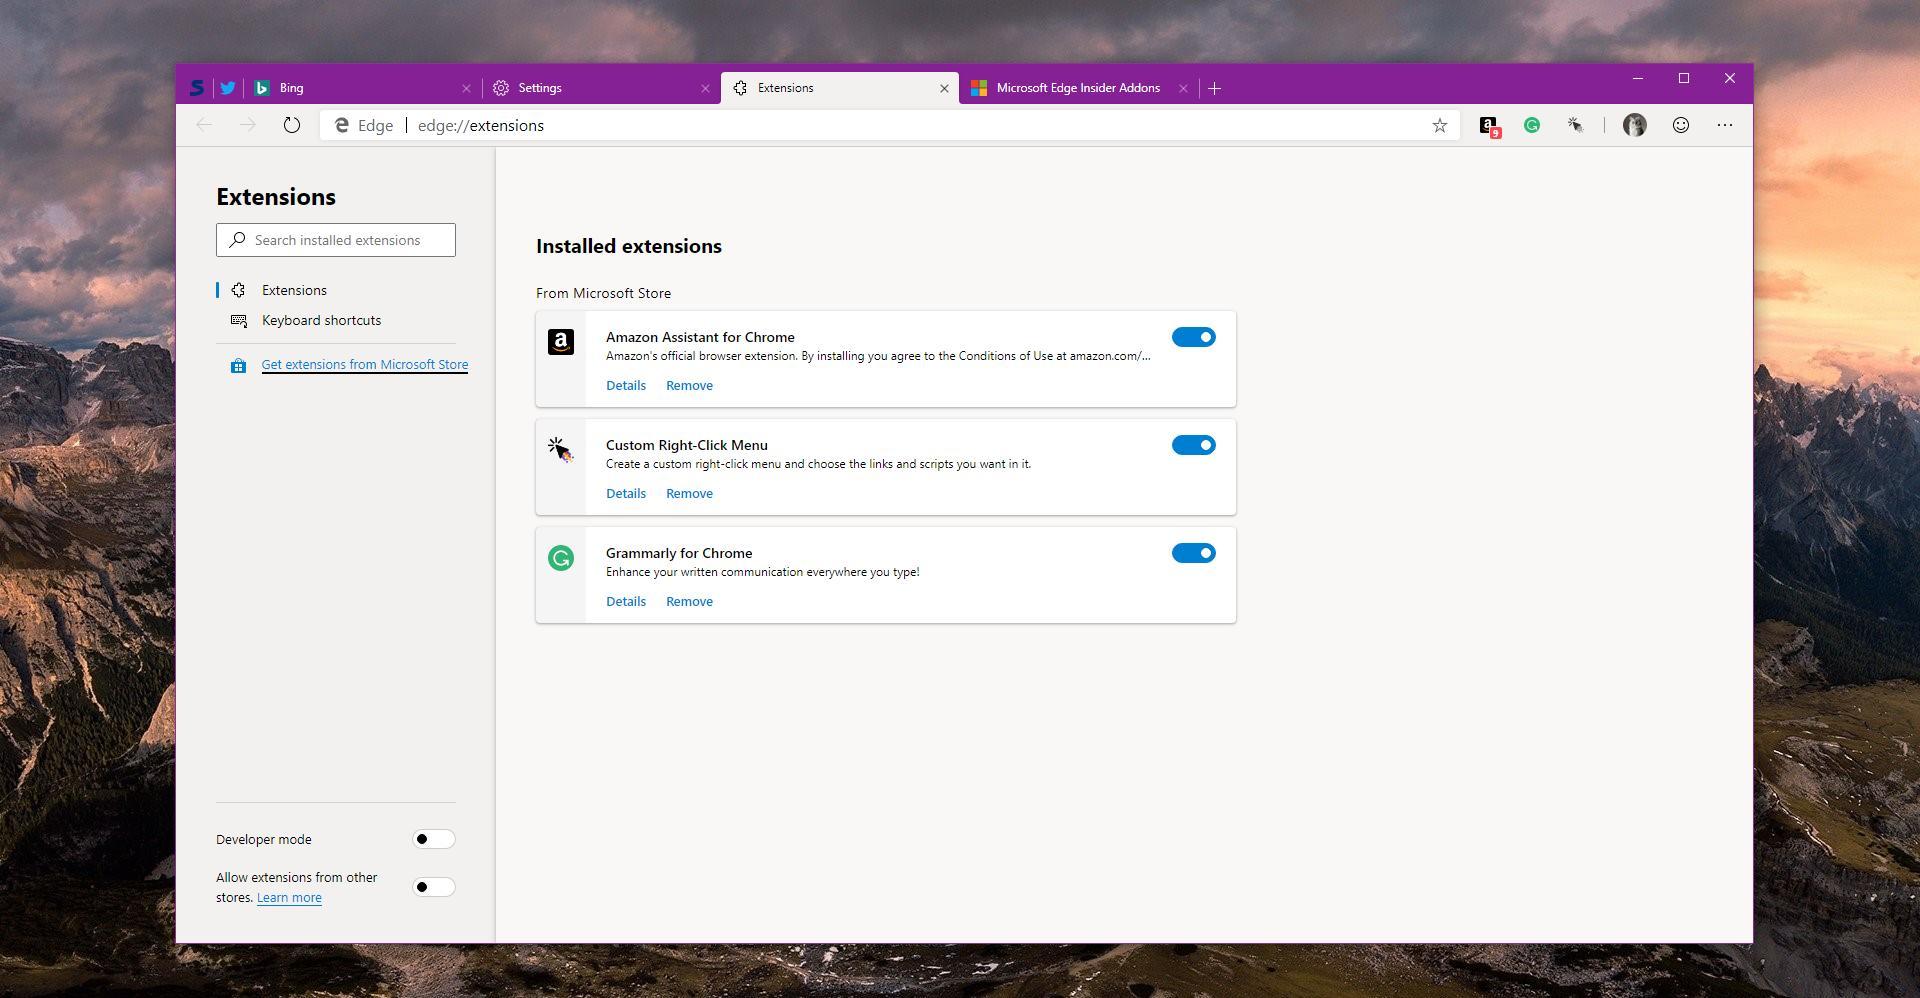 Chromium-Based Microsoft Edge Browser: Everything You Need